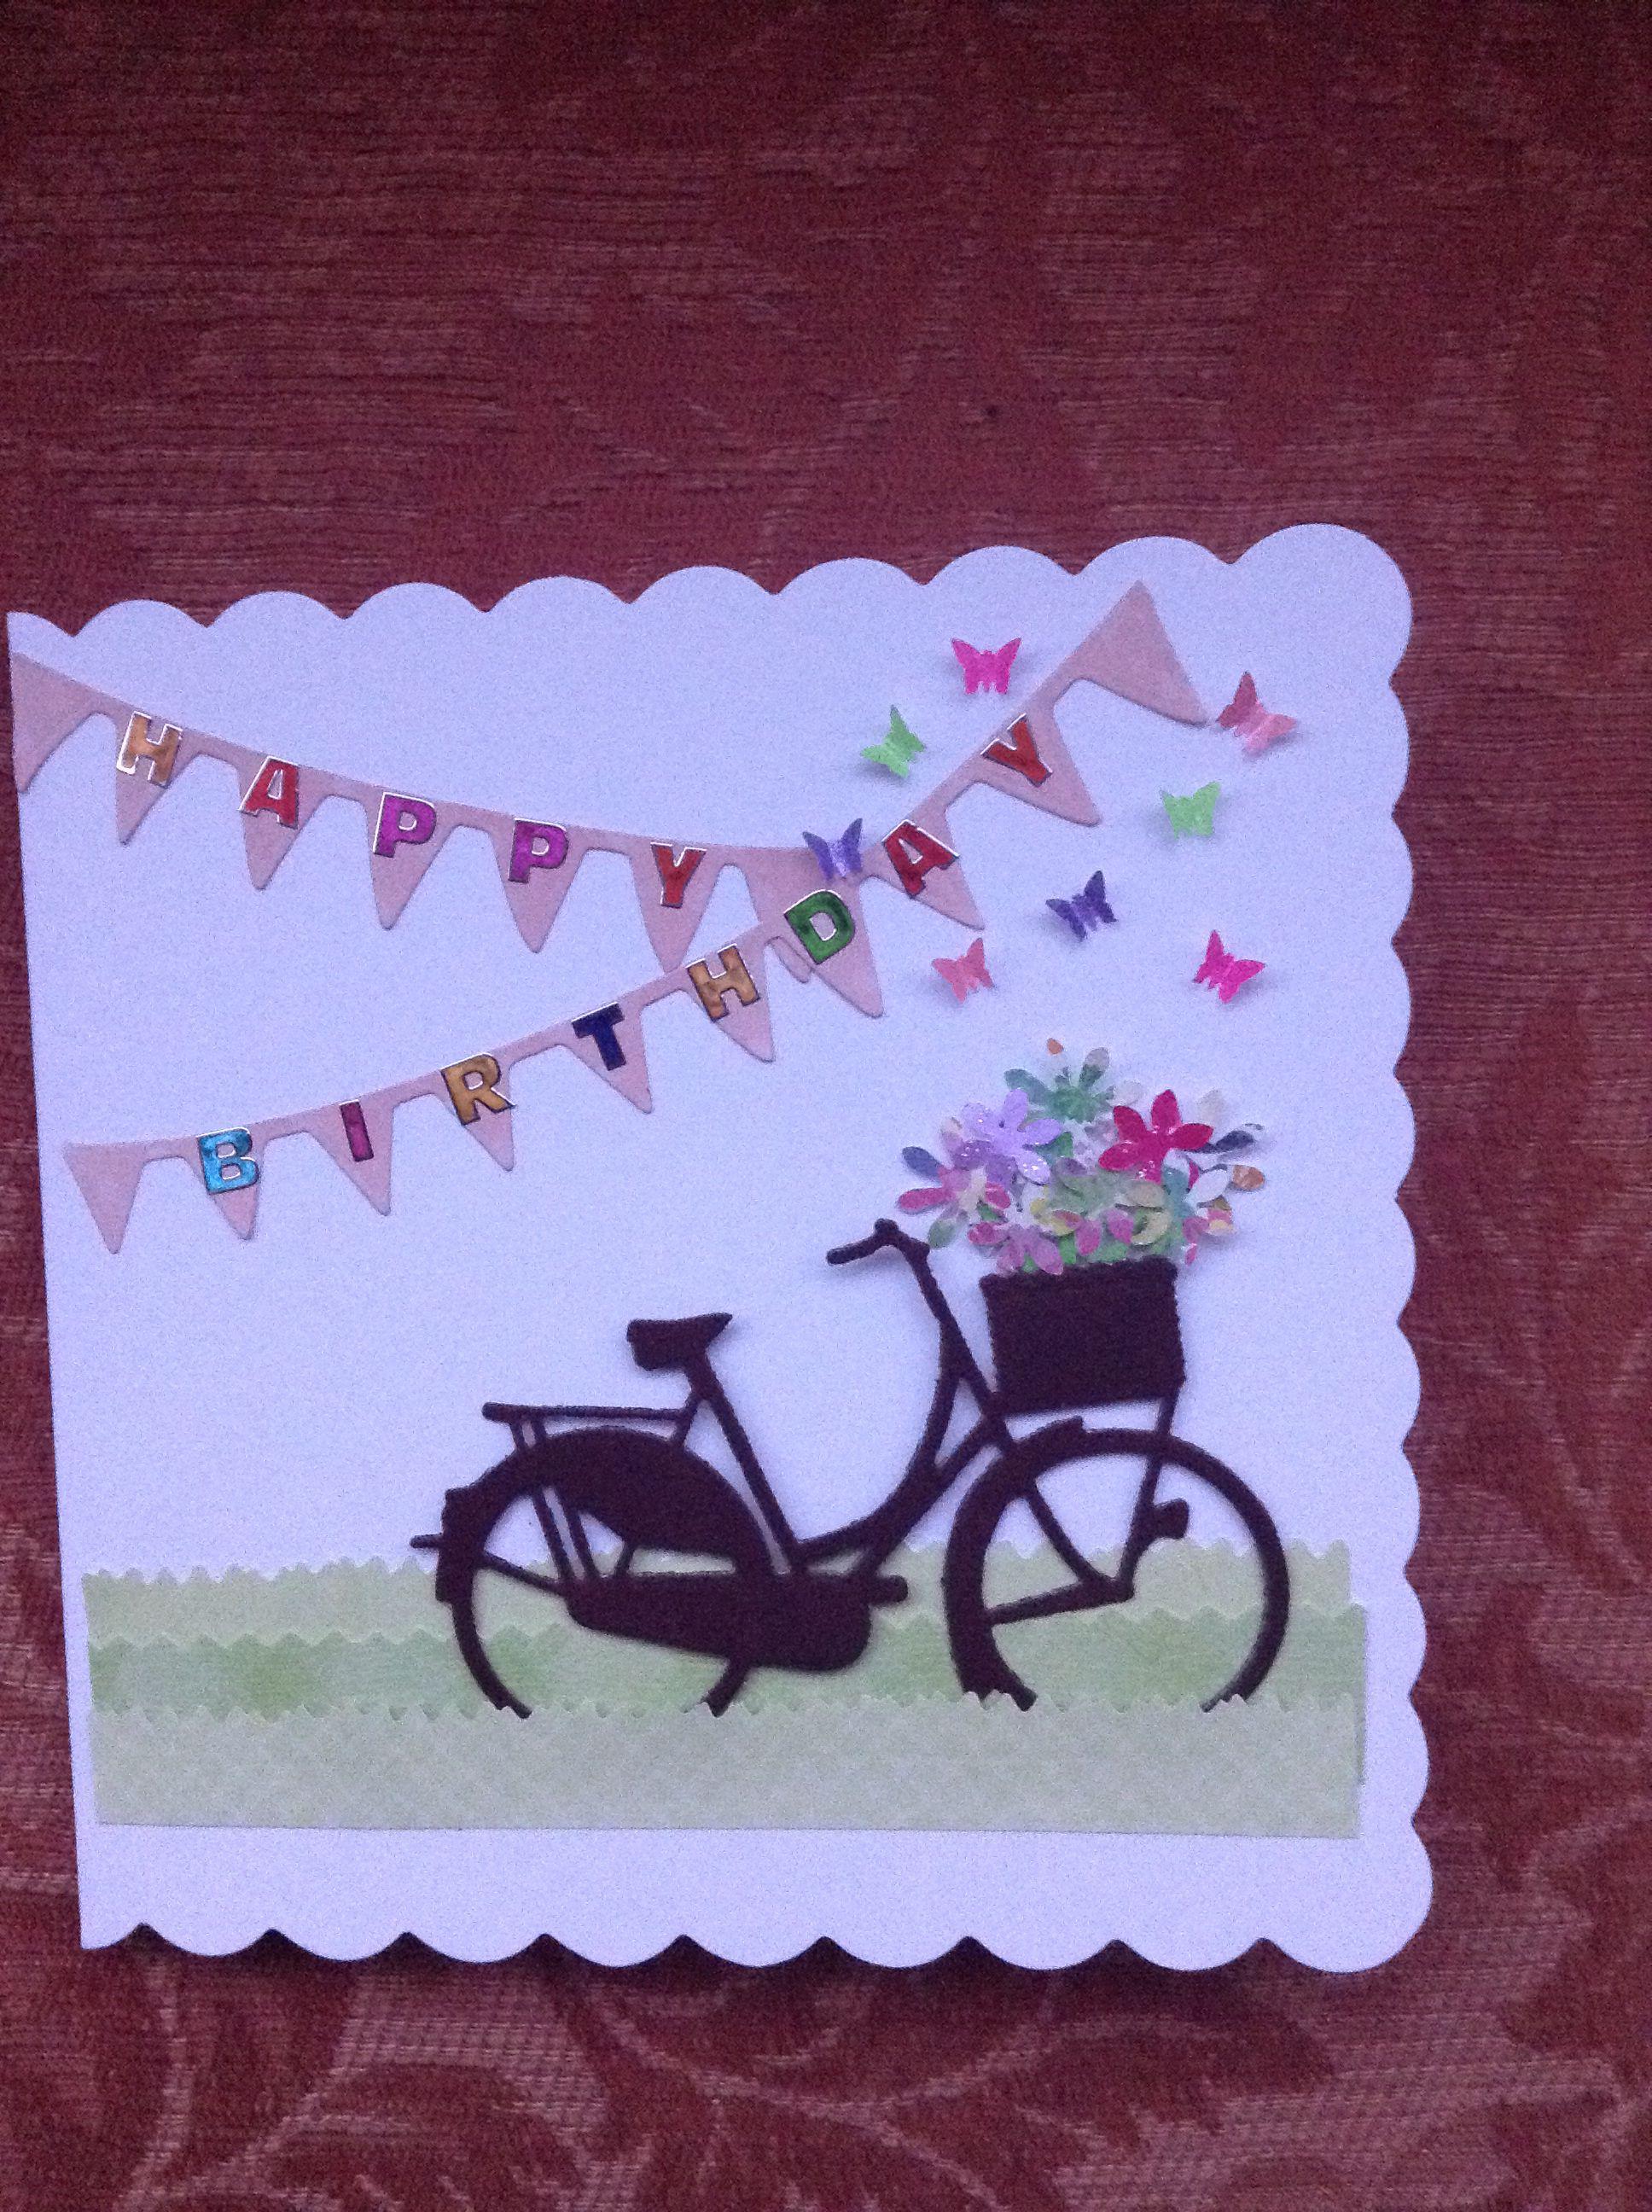 Card With Bicycle Bikecard Card Bike Bicycle Birthday Card Cool Birthday Cards Birthday Card Craft Card Craft